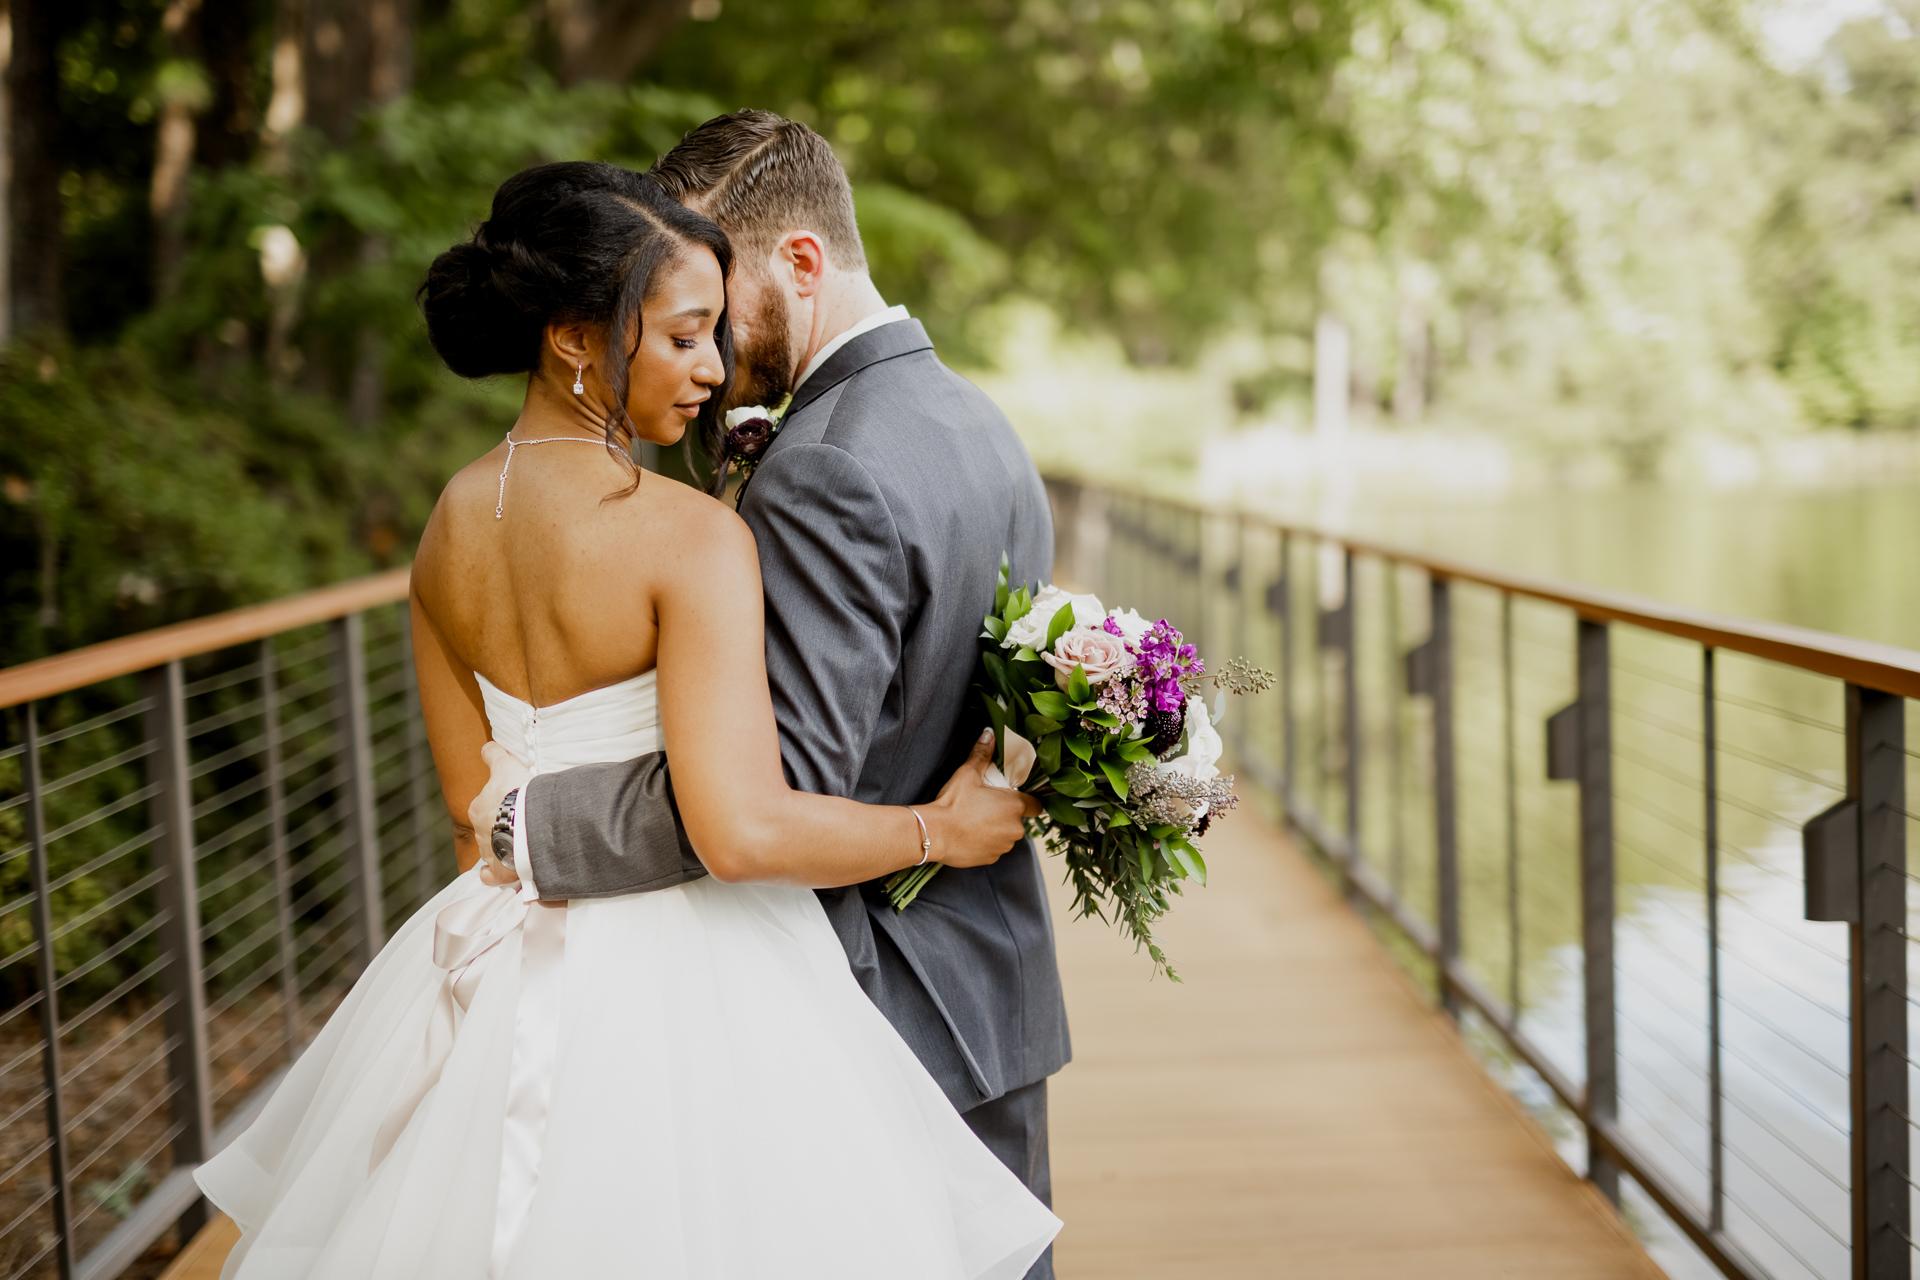 Yearwood-Fogarty Wedding-PREVIEW-4.jpg